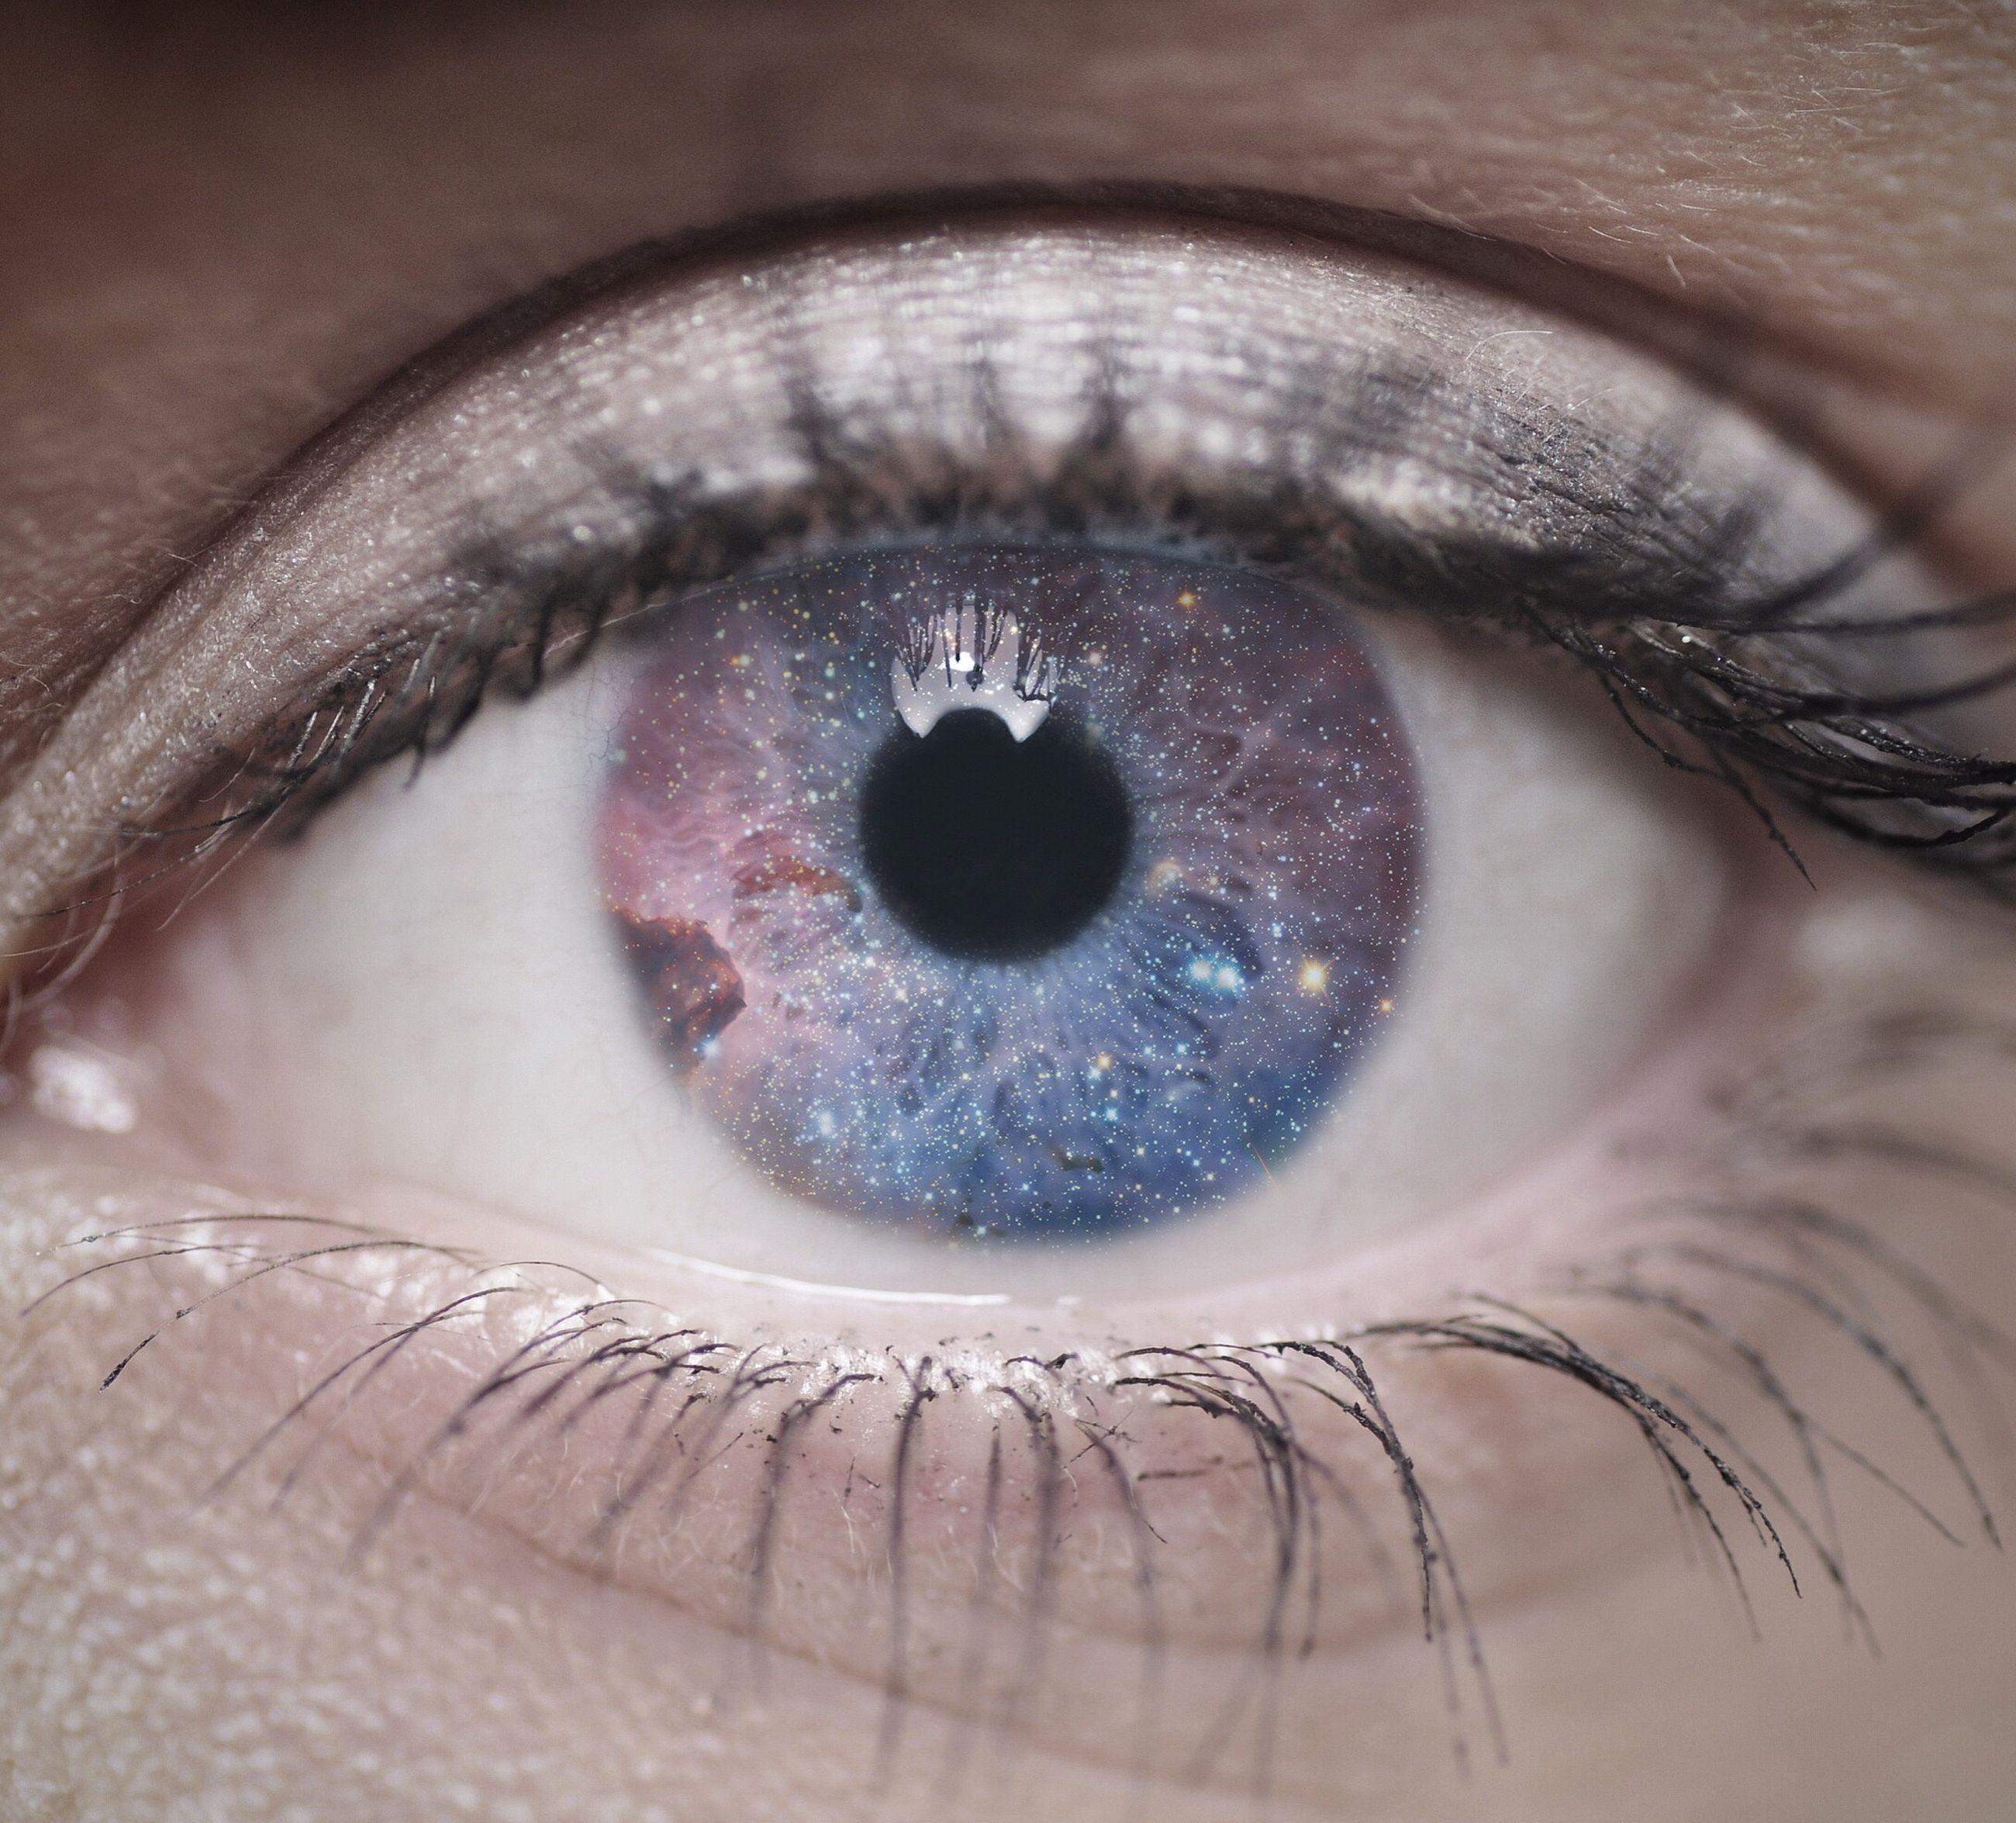 human body part, human eye, eyesight, close-up, eyelash, extreme close-up, iris - eye, looking at camera, eyeball, one person, sensory perception, people, adults only, beauty, adult, one woman only, outdoors, day